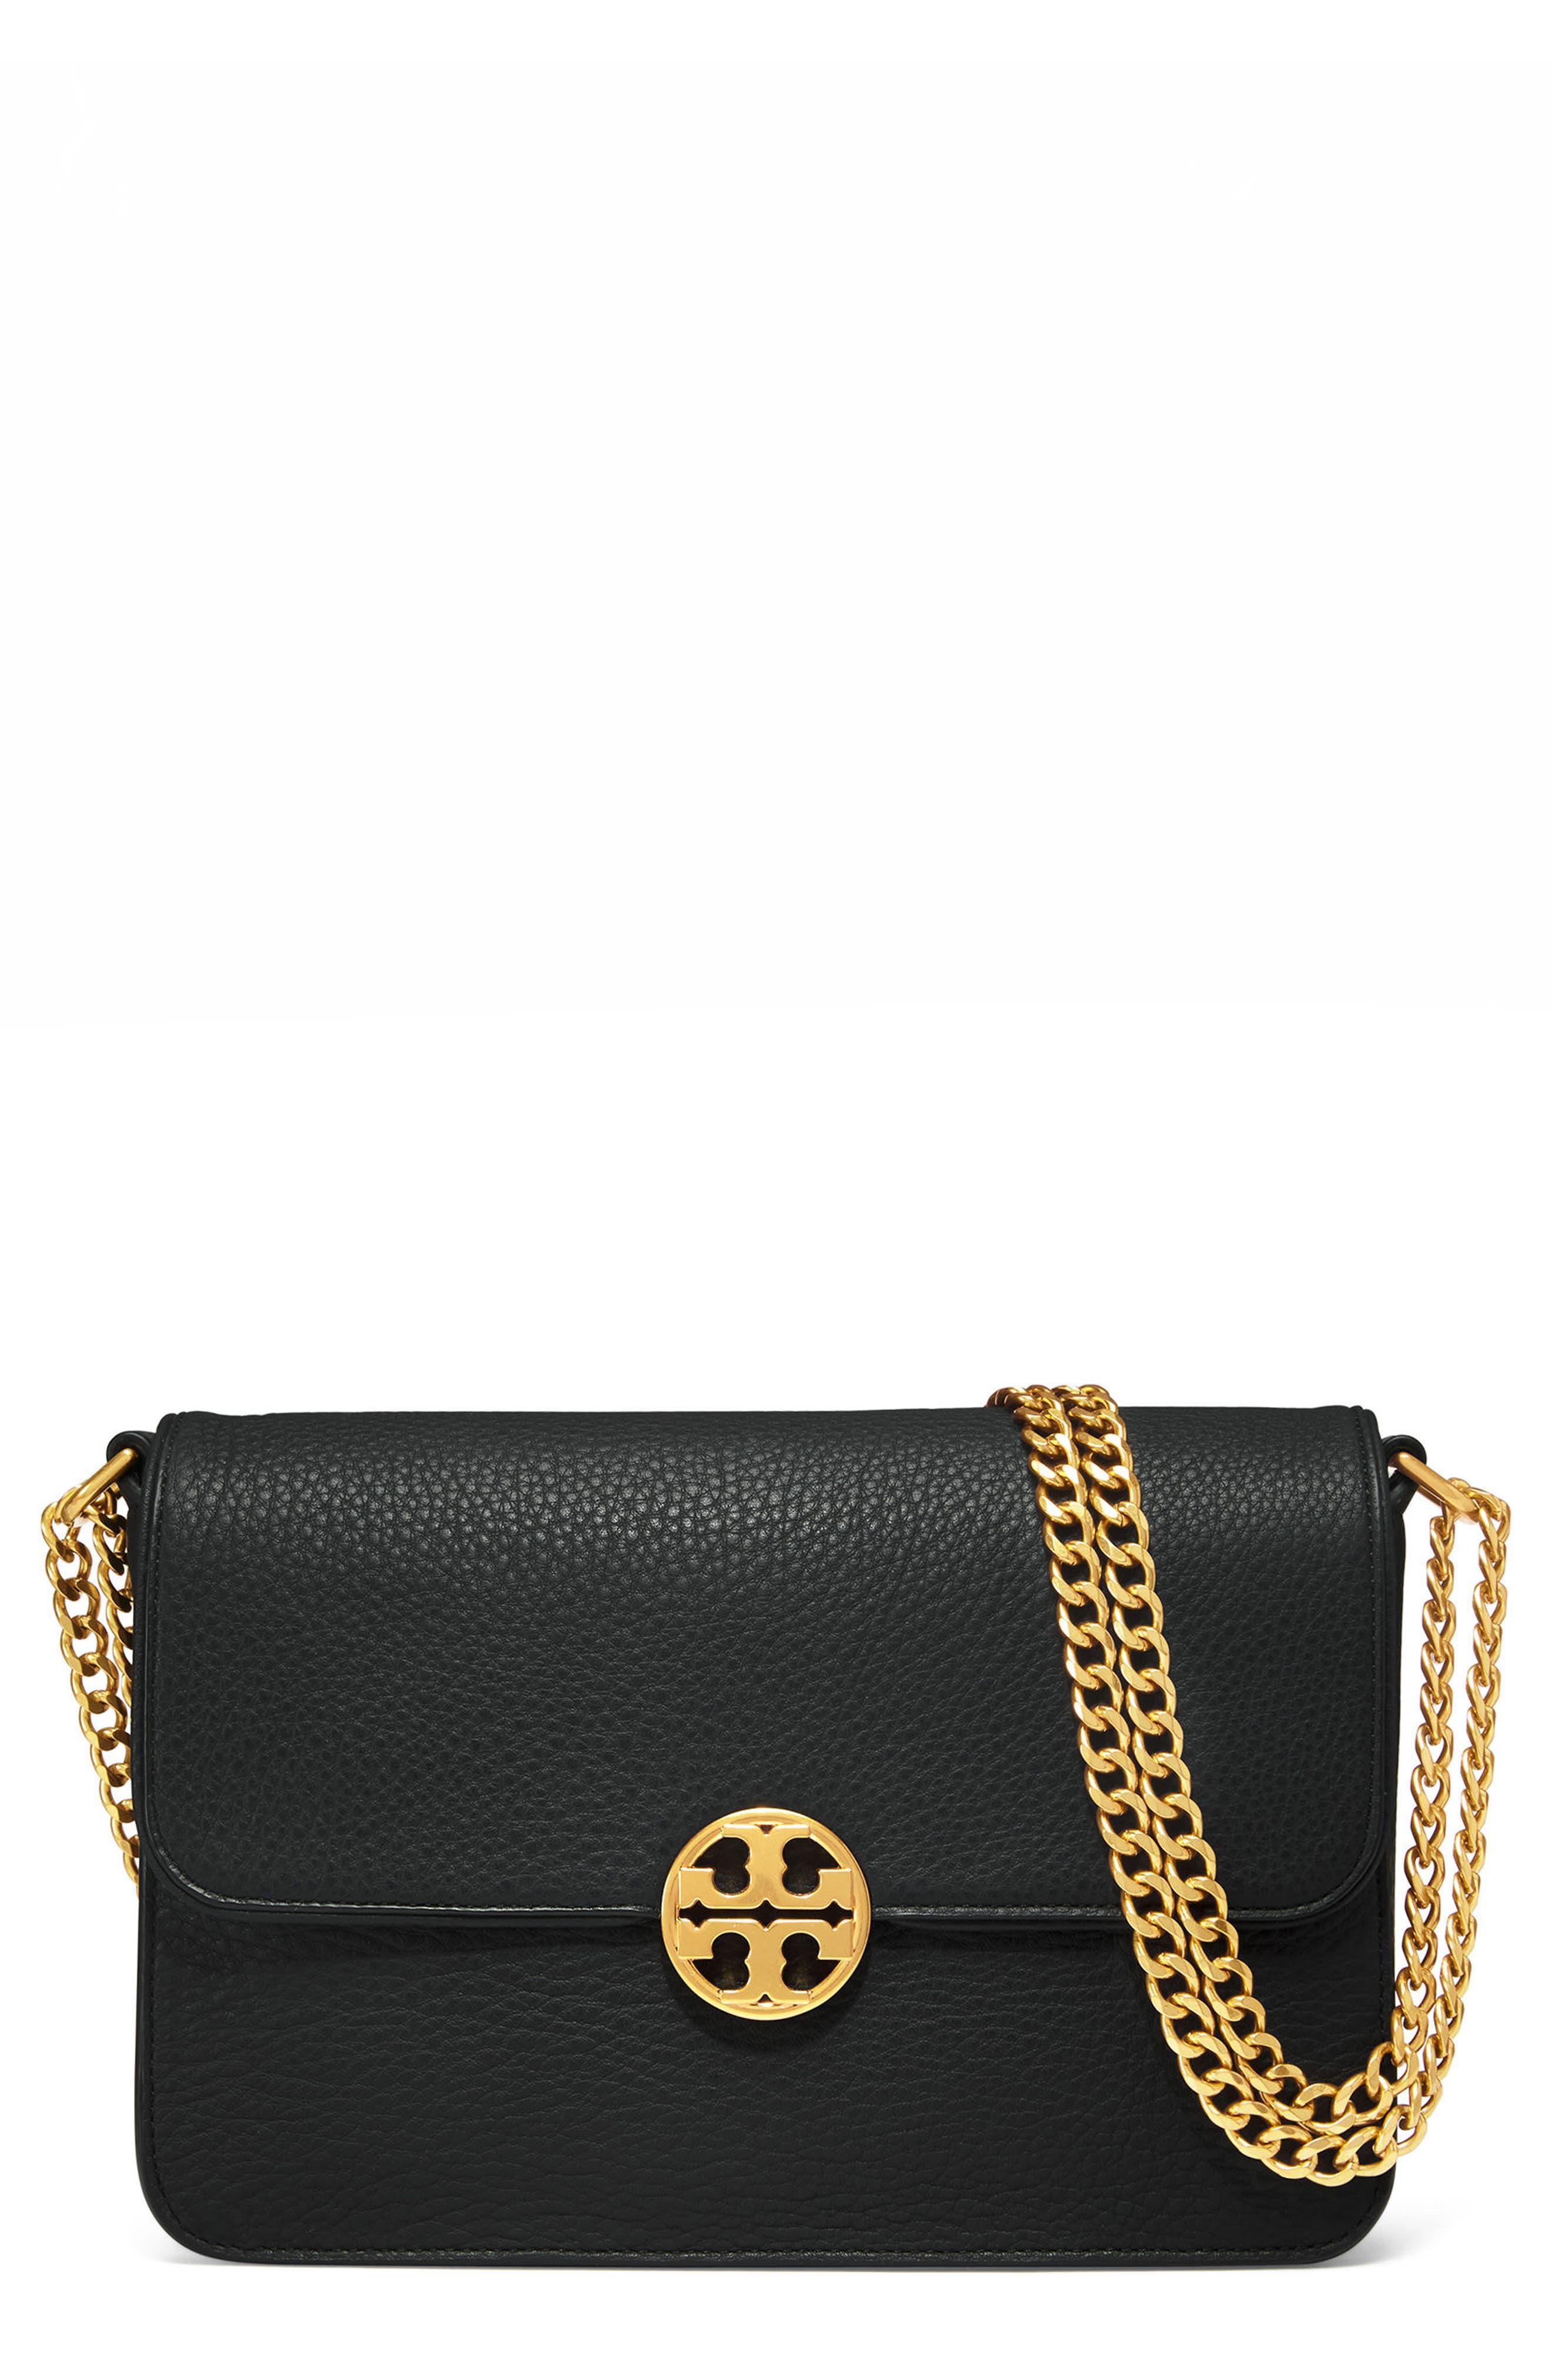 Main Image - Tory Burch Chelsea Leather Shoulder Bag